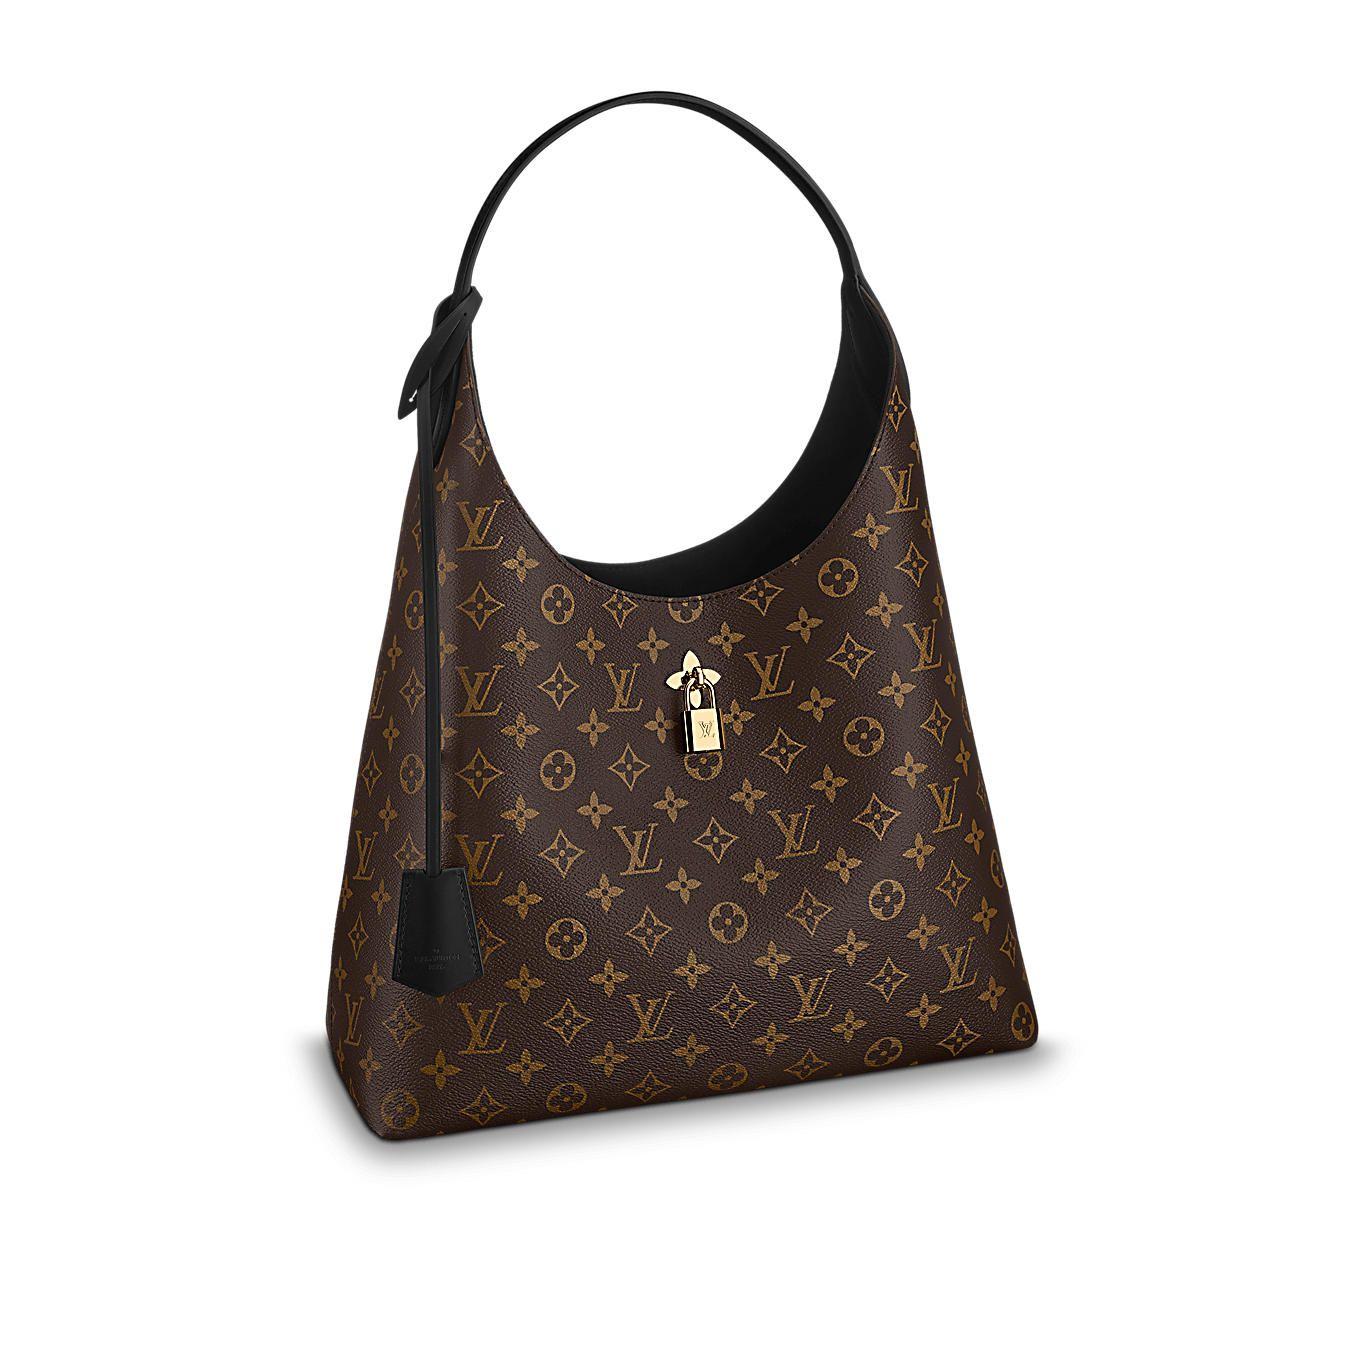 Https Eu Louisvuitton Eng E1 Products